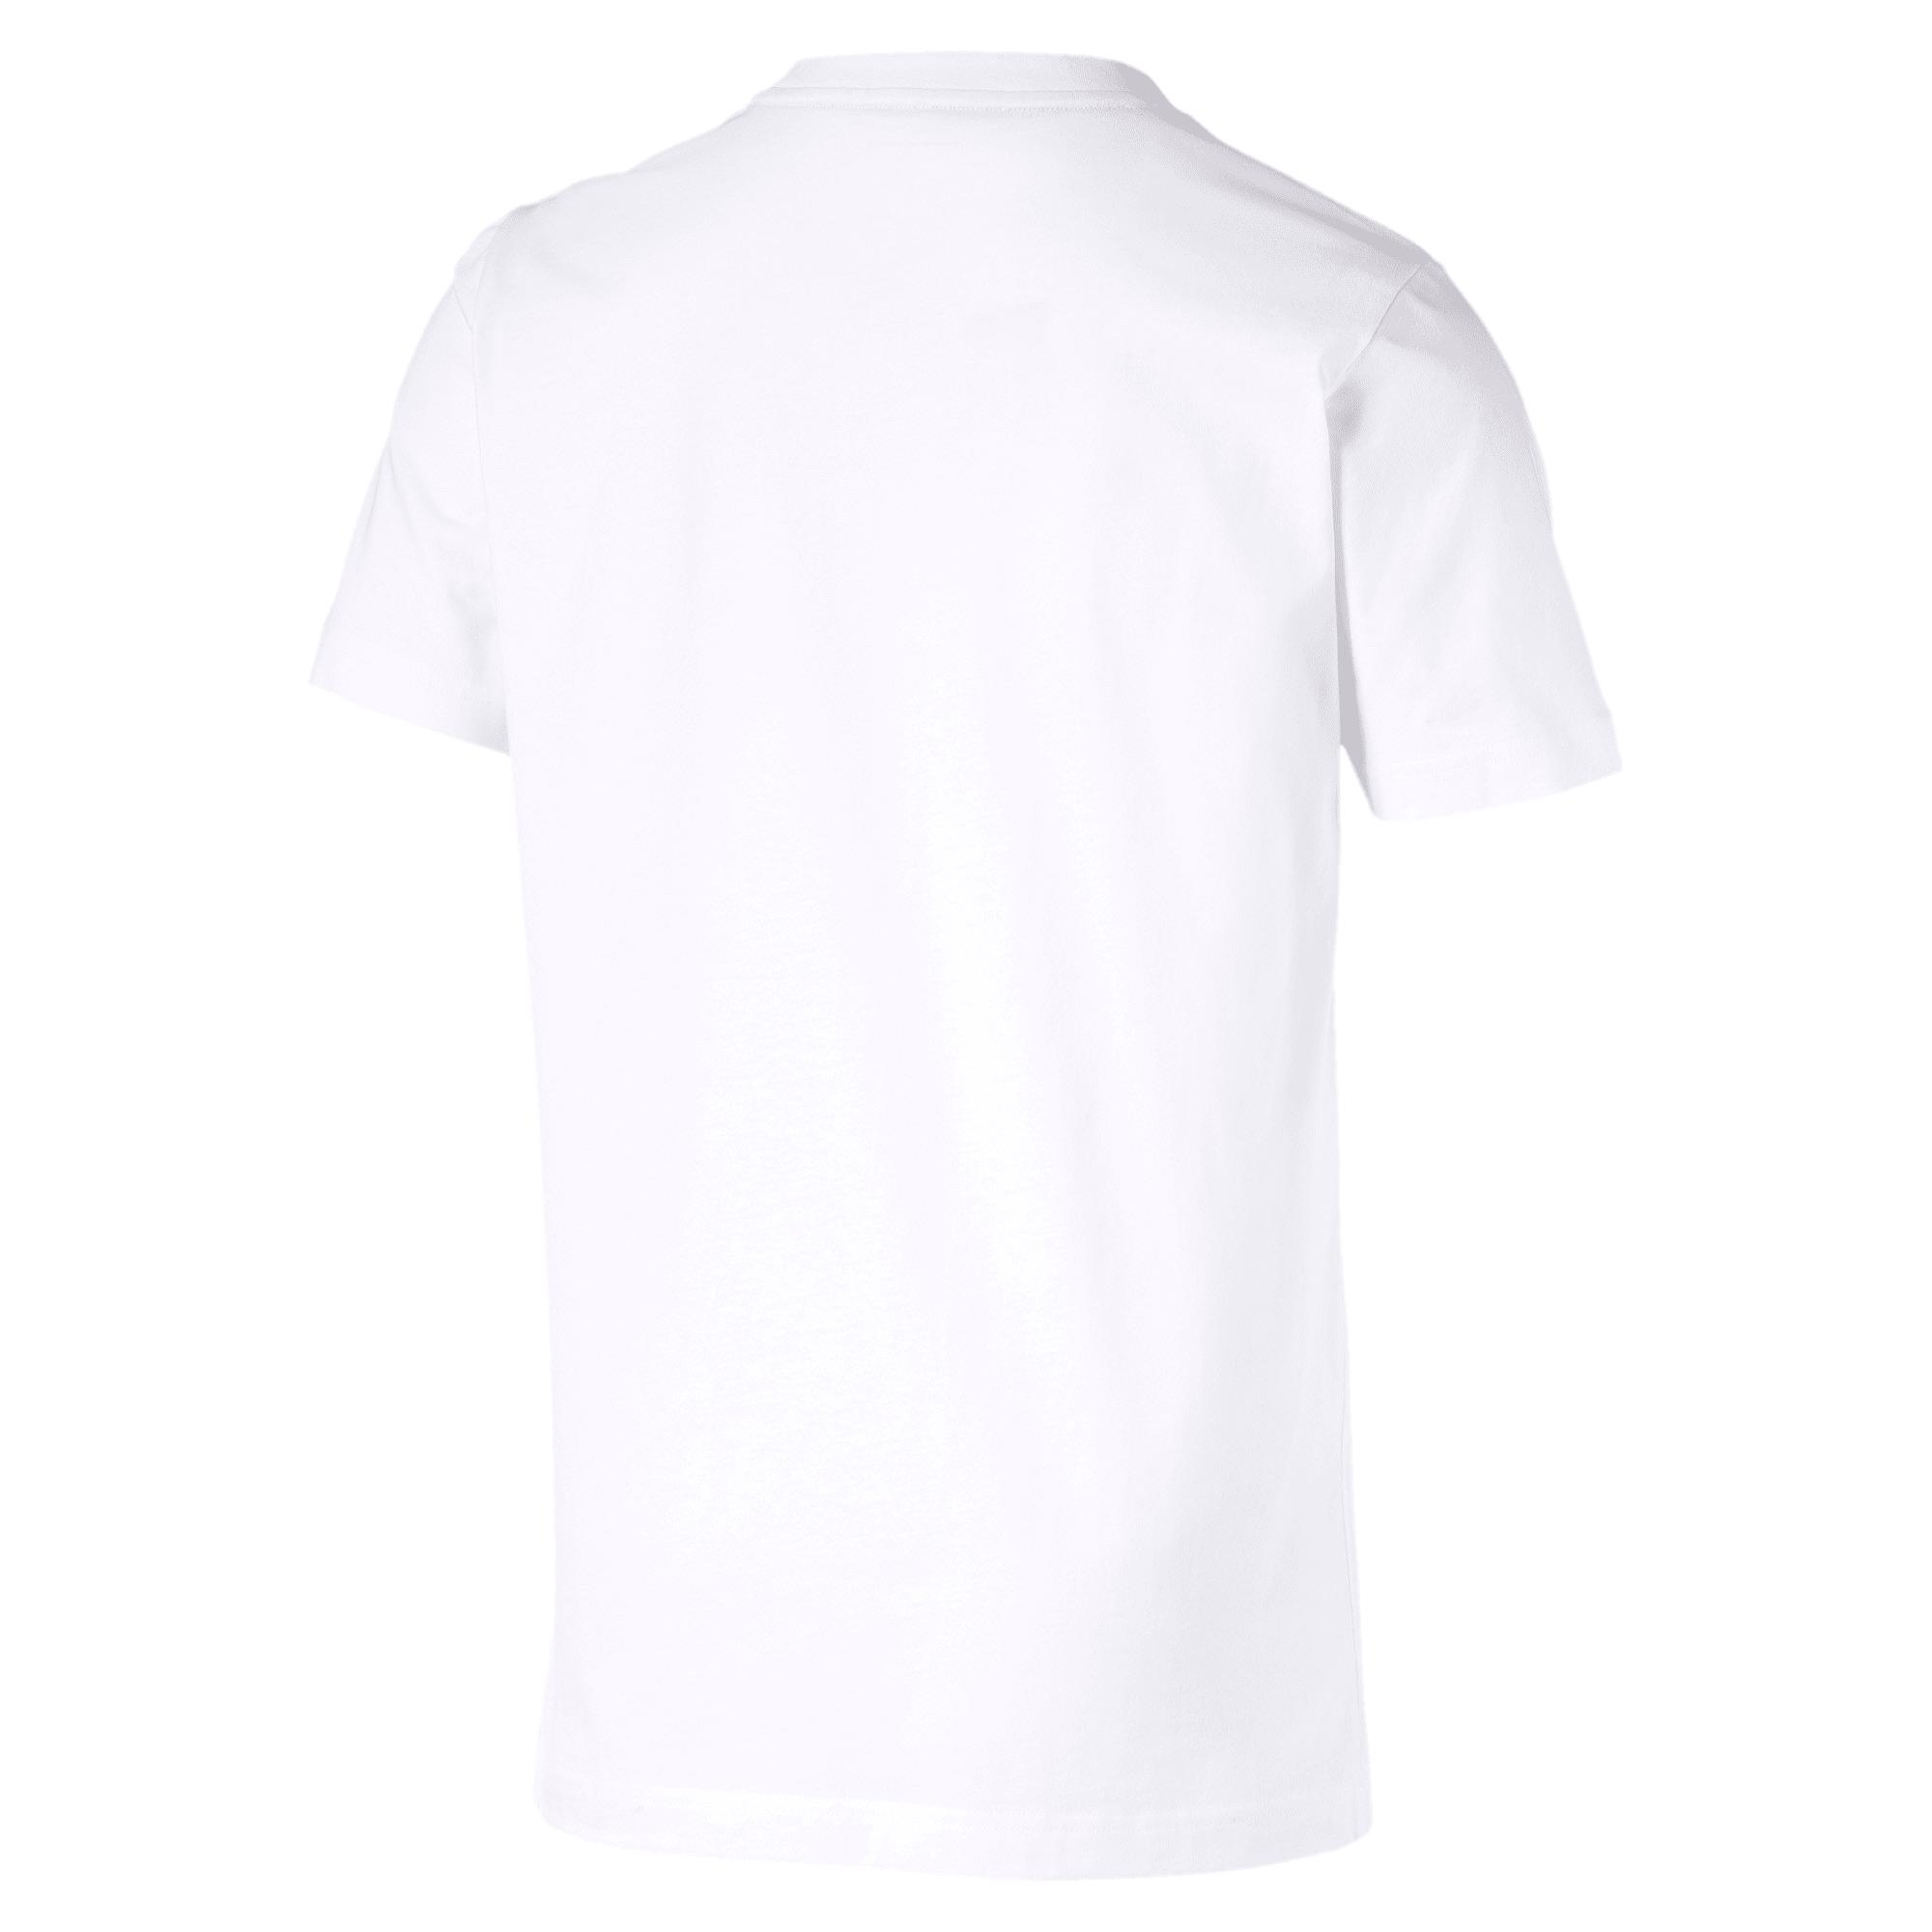 Thumbnail 5 of Red Bull Racing logo-T-shirt voor heren, Puma White, medium